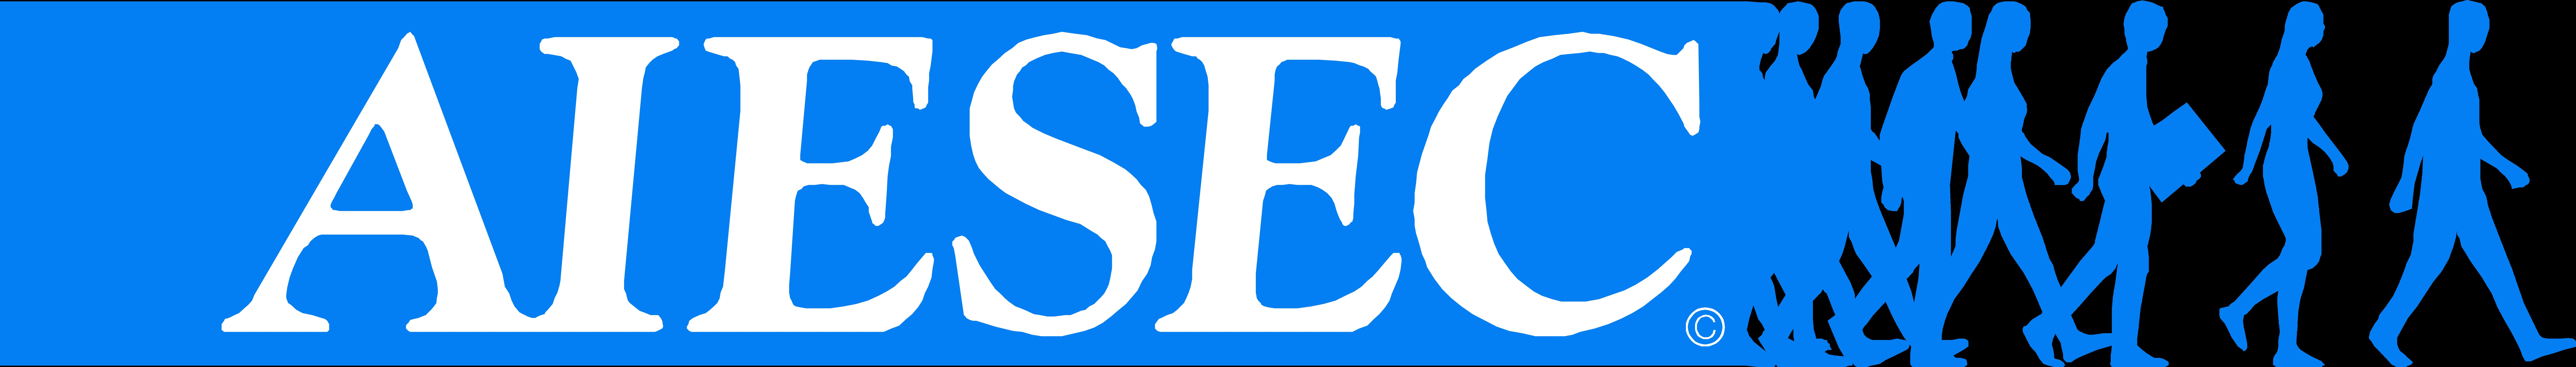 AIESEC広島委員会